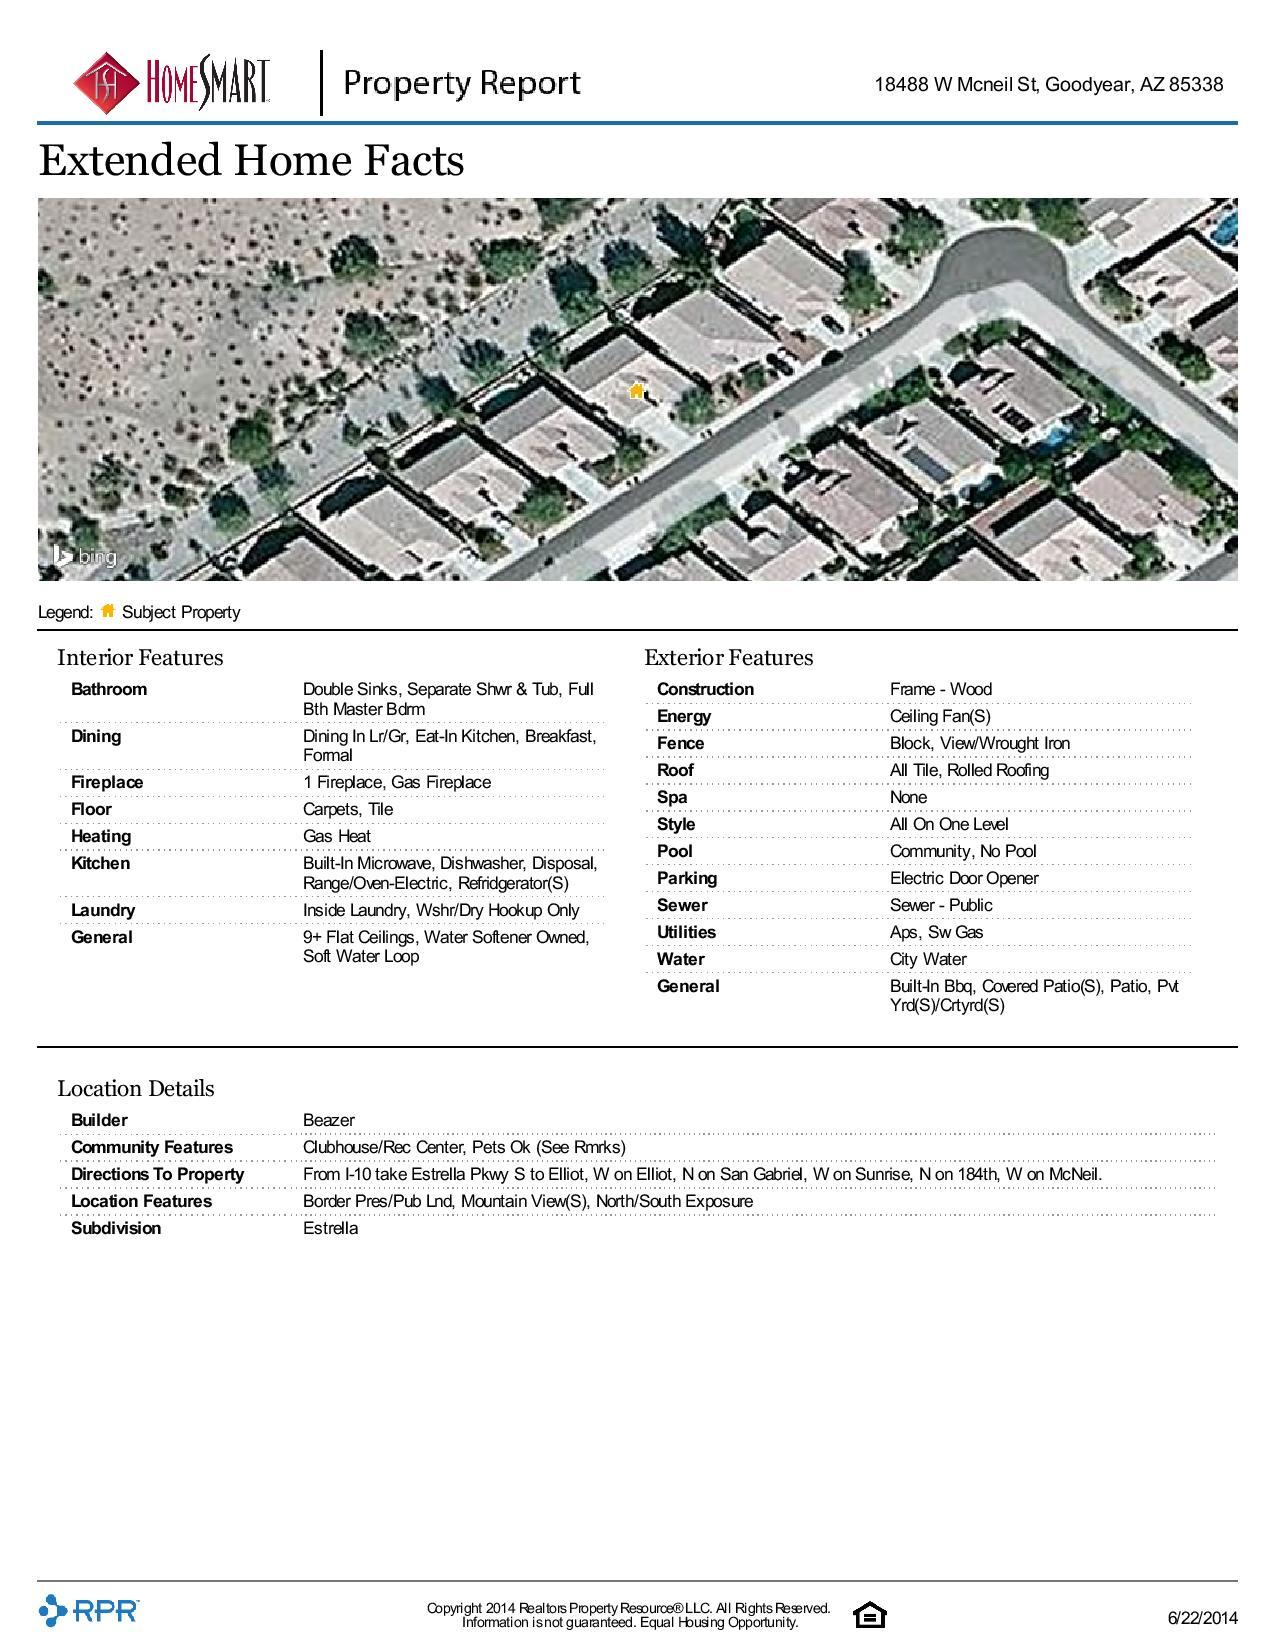 18488-W-Mcneil-St-Goodyear-AZ-85338-page-004